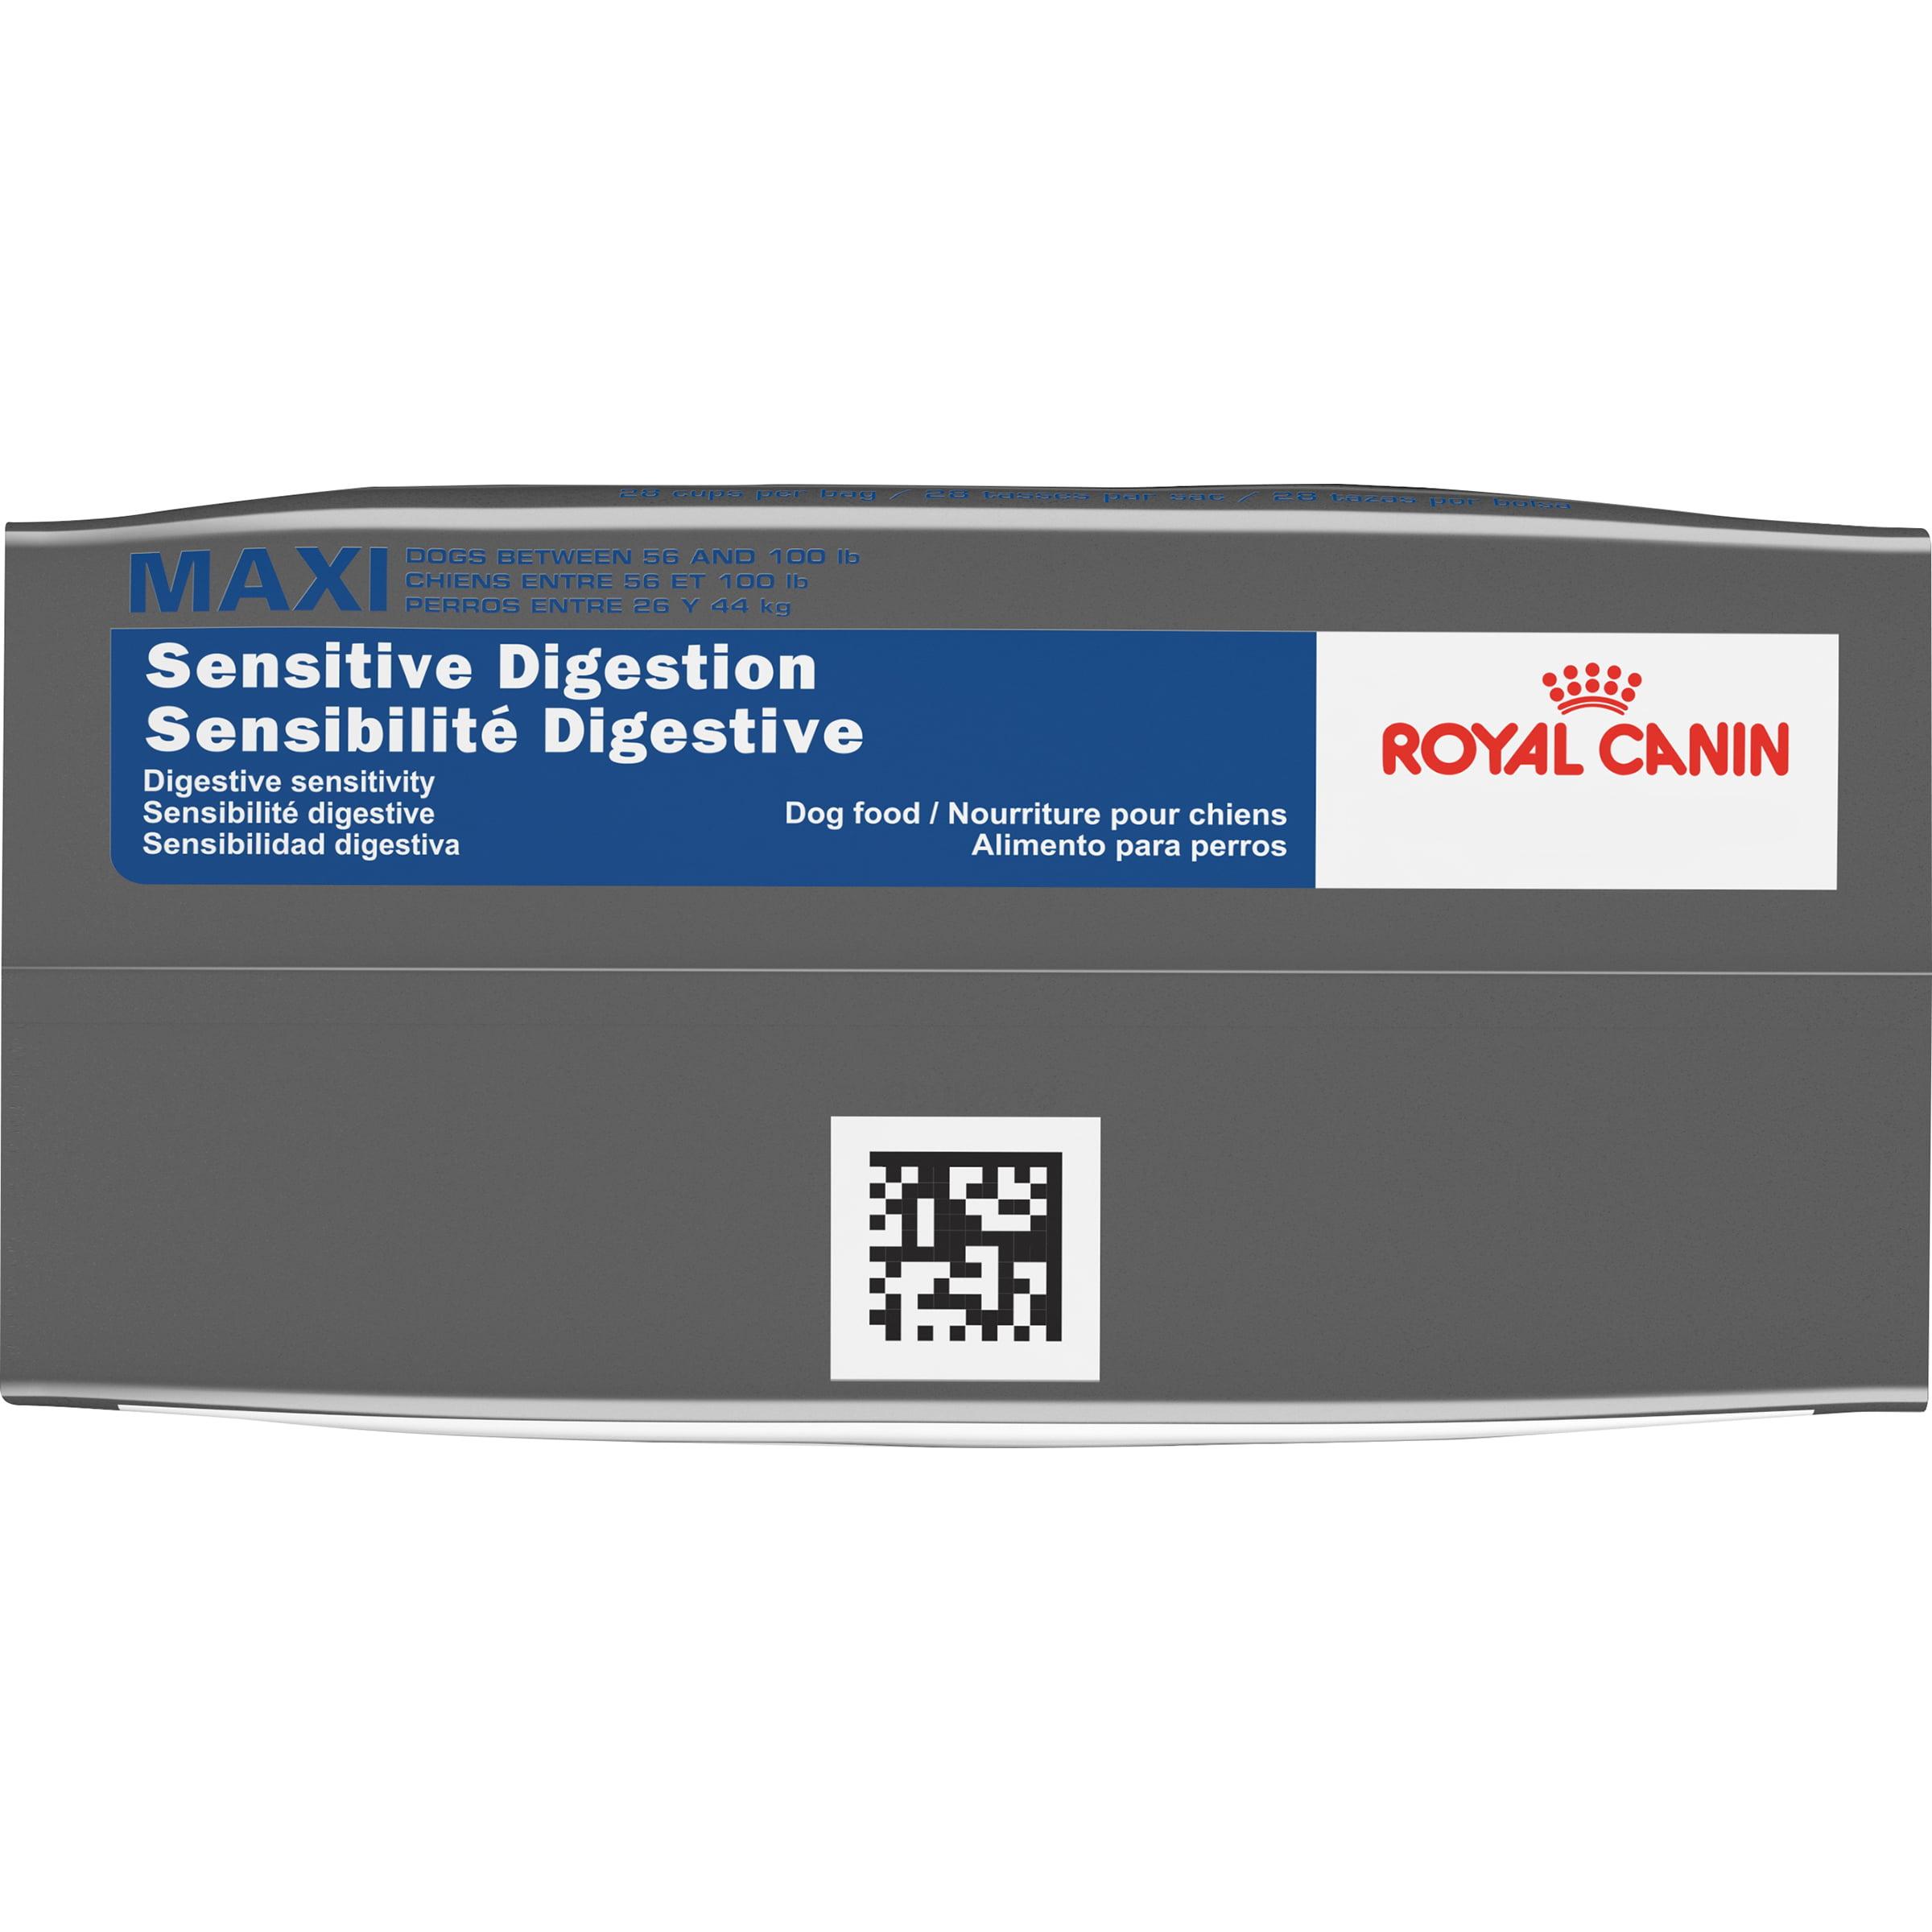 Royal Canin Maxi Sensitive Digestion Large Breed Dry Dog Food 30 Lb Pro Plan Adult 25kg Free Mug